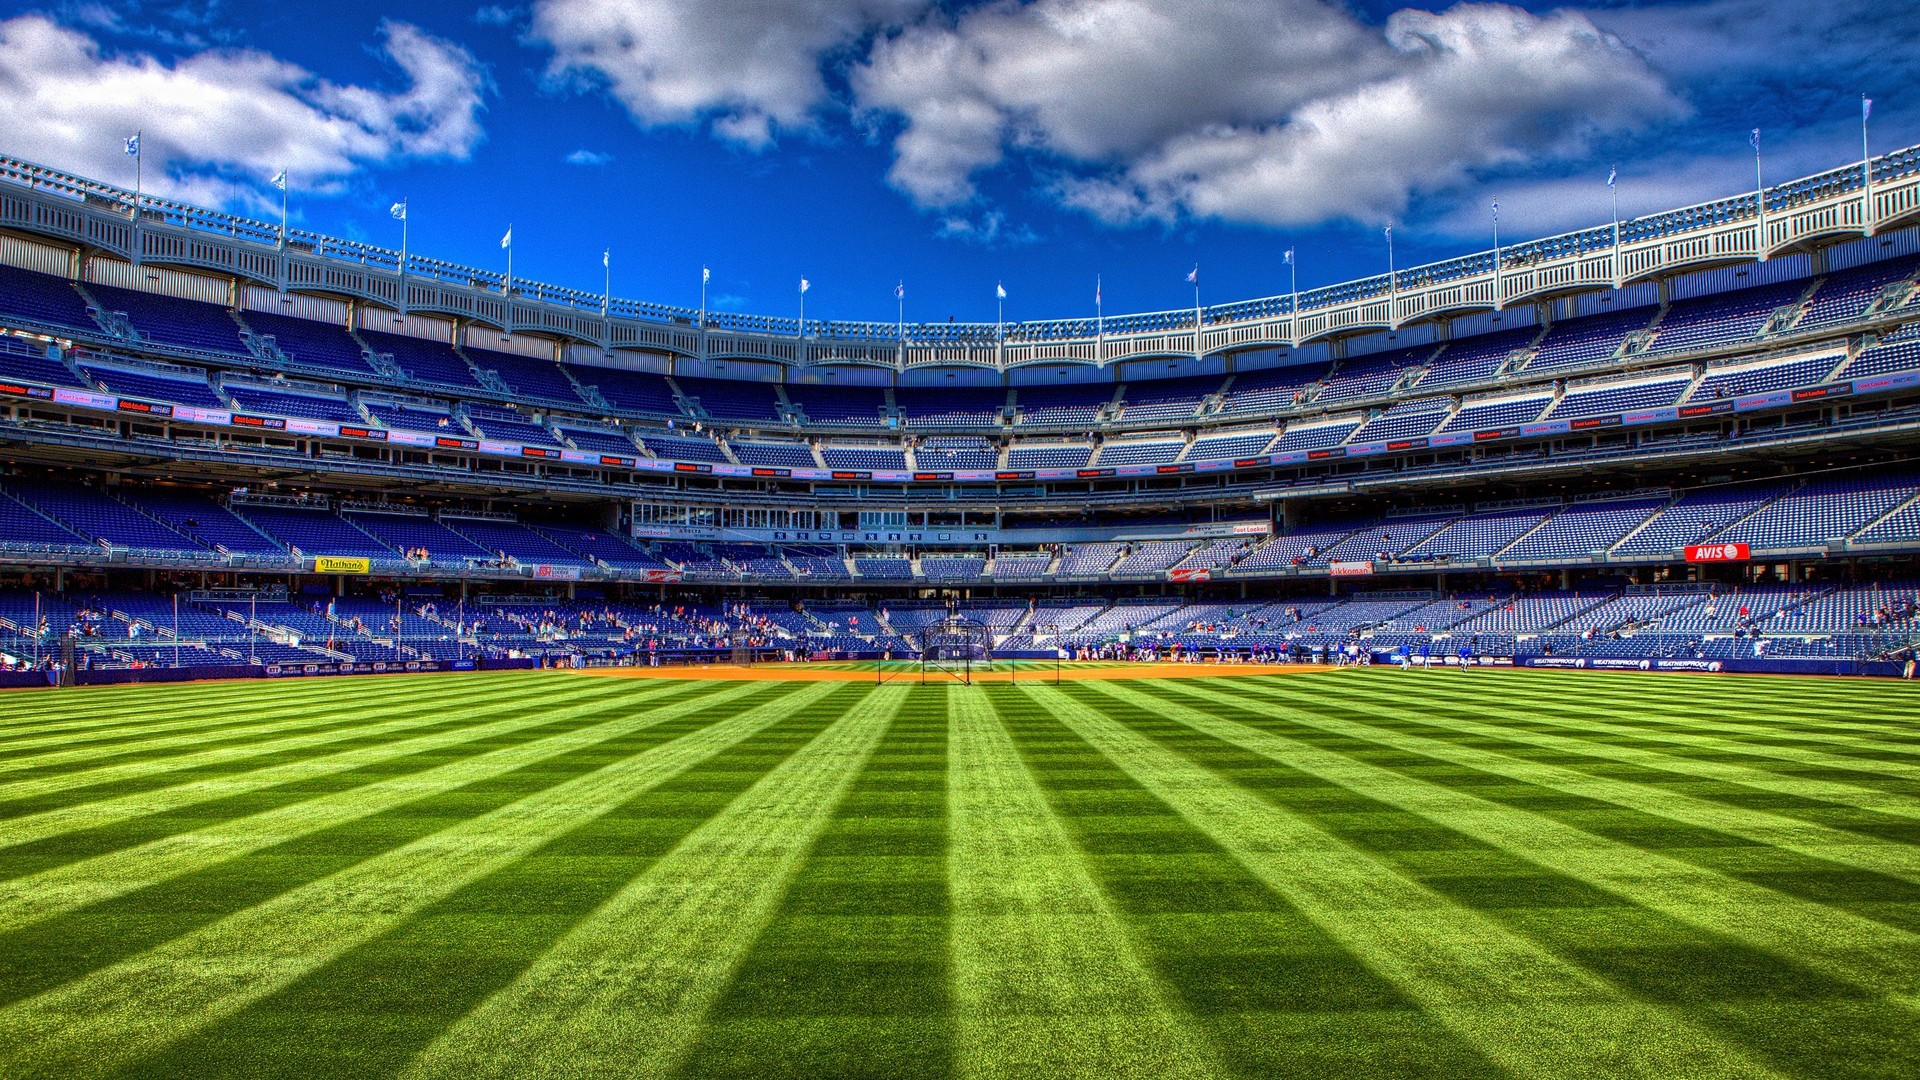 Baseball Field Wallpaper